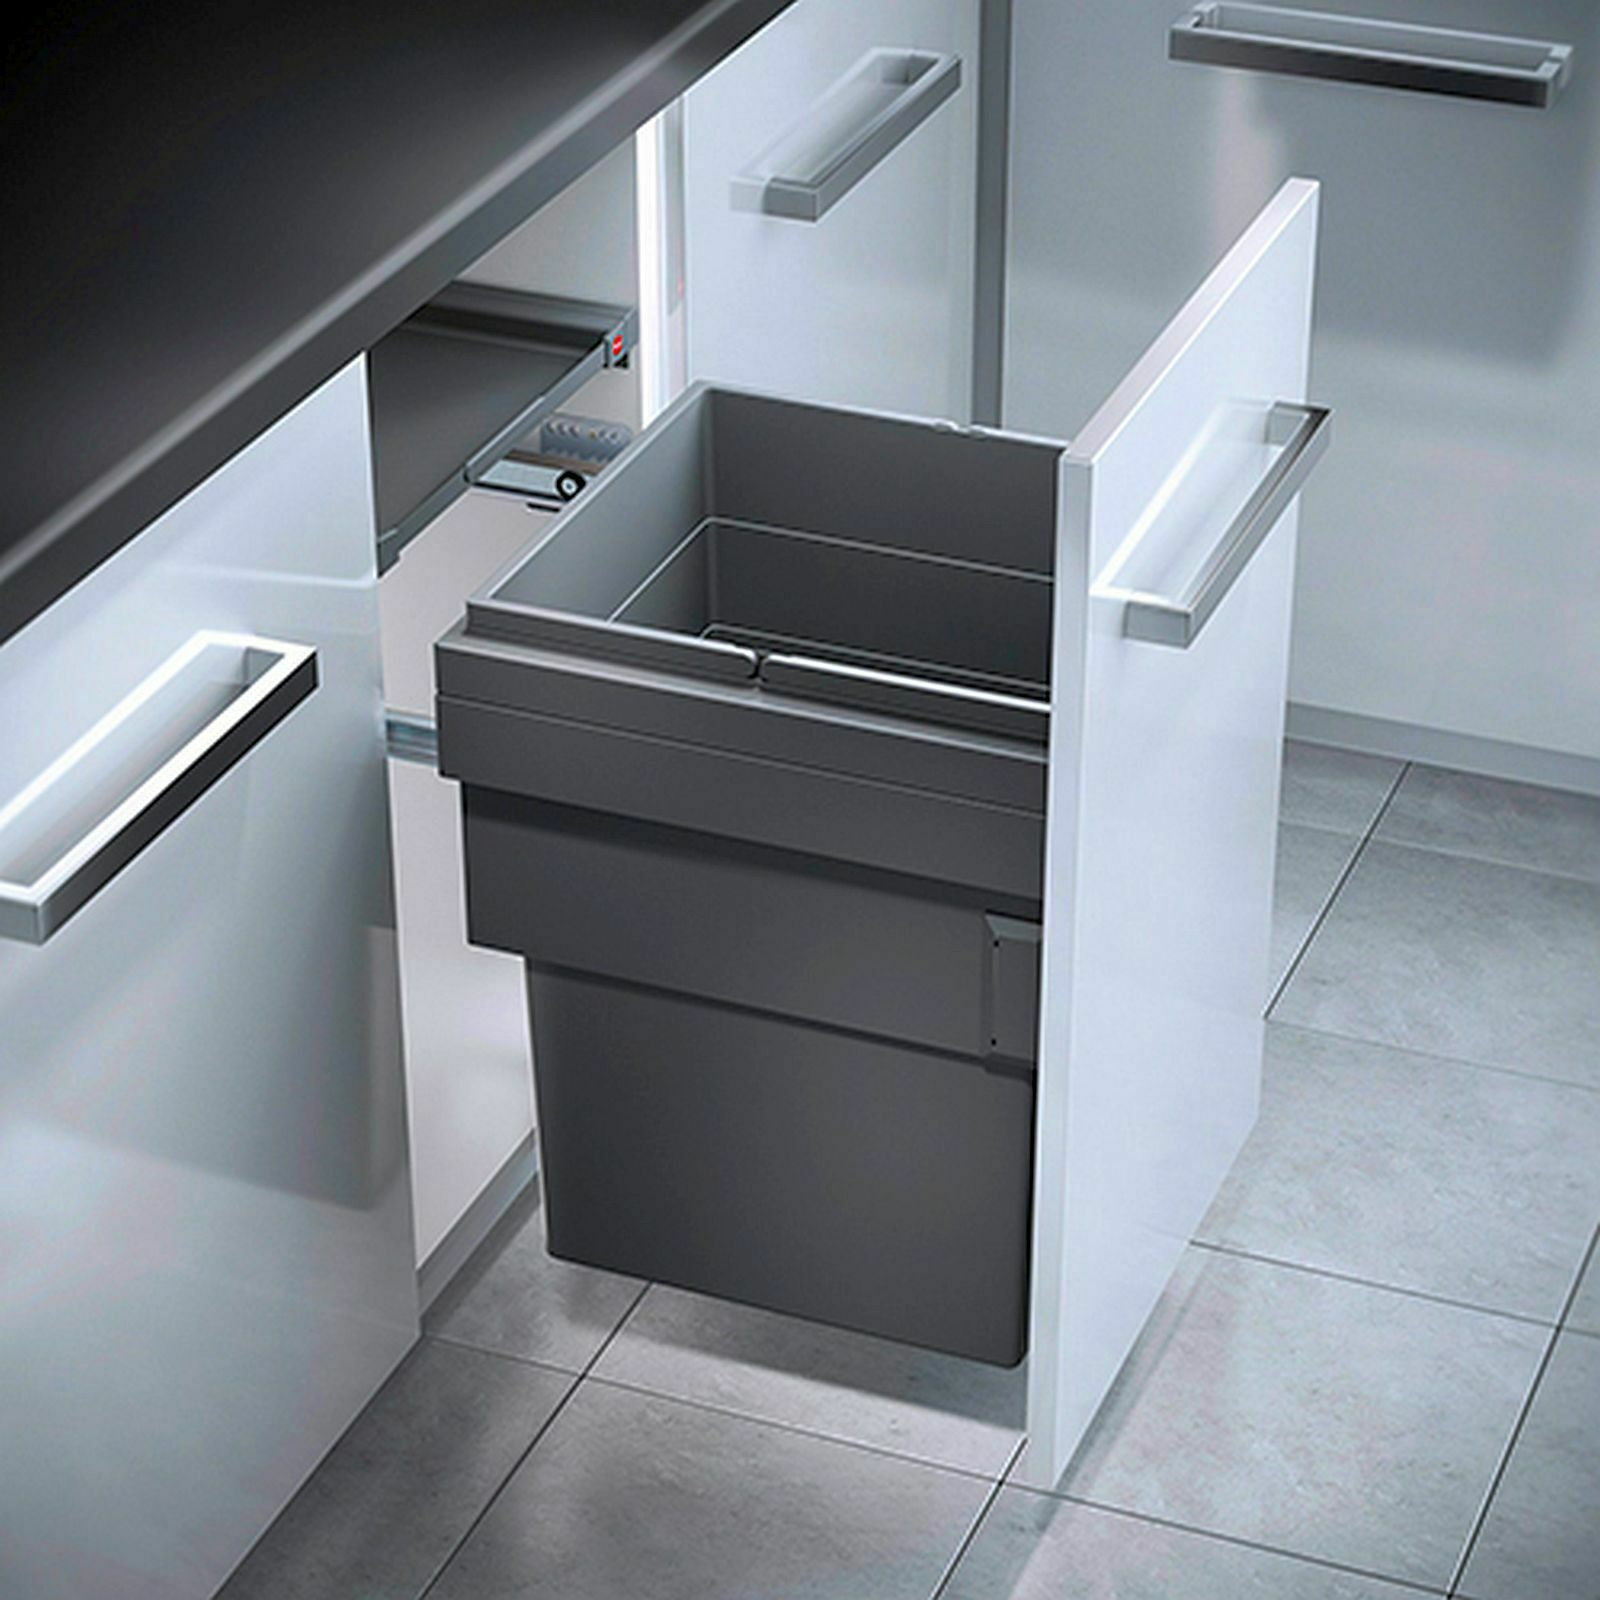 Full Size of Abfalleimer Küche 3 Fach Abfalleimer Küche Kaufen Einbau Abfalleimer Küche Kleiner Abfalleimer Küche Küche Abfalleimer Küche